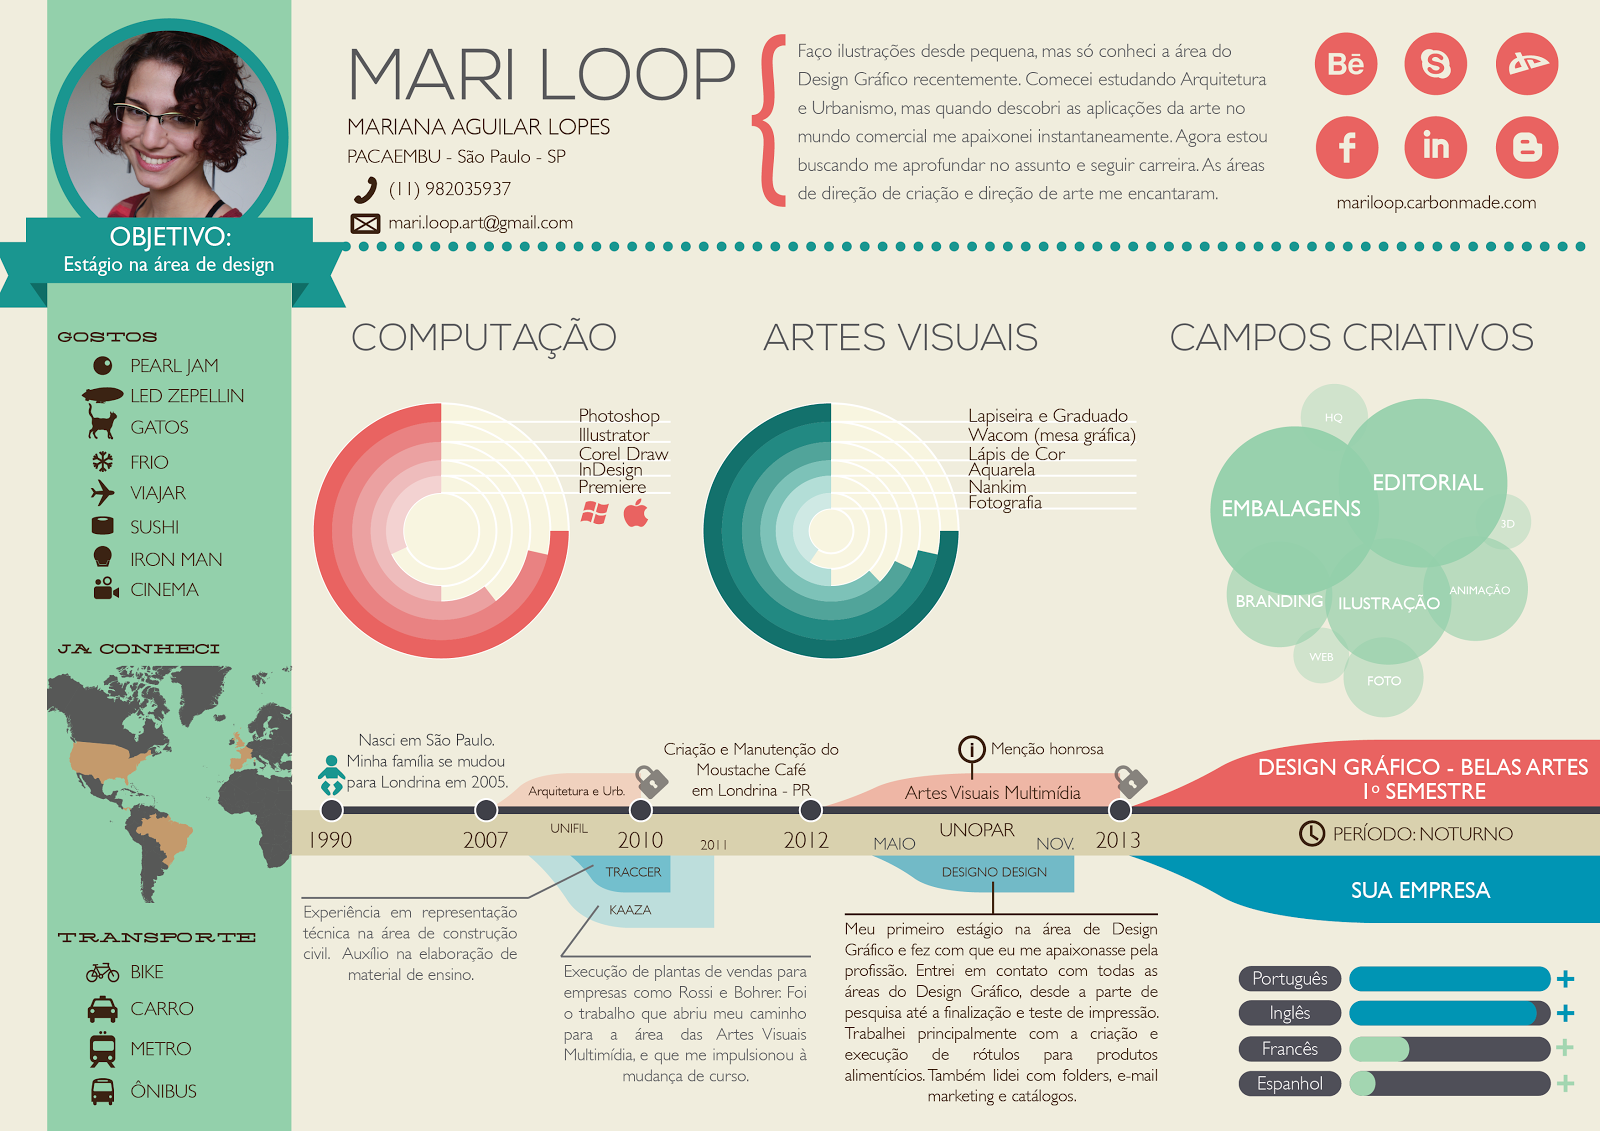 15 Graphic Designer Resume Infographic Images - Graphic ...